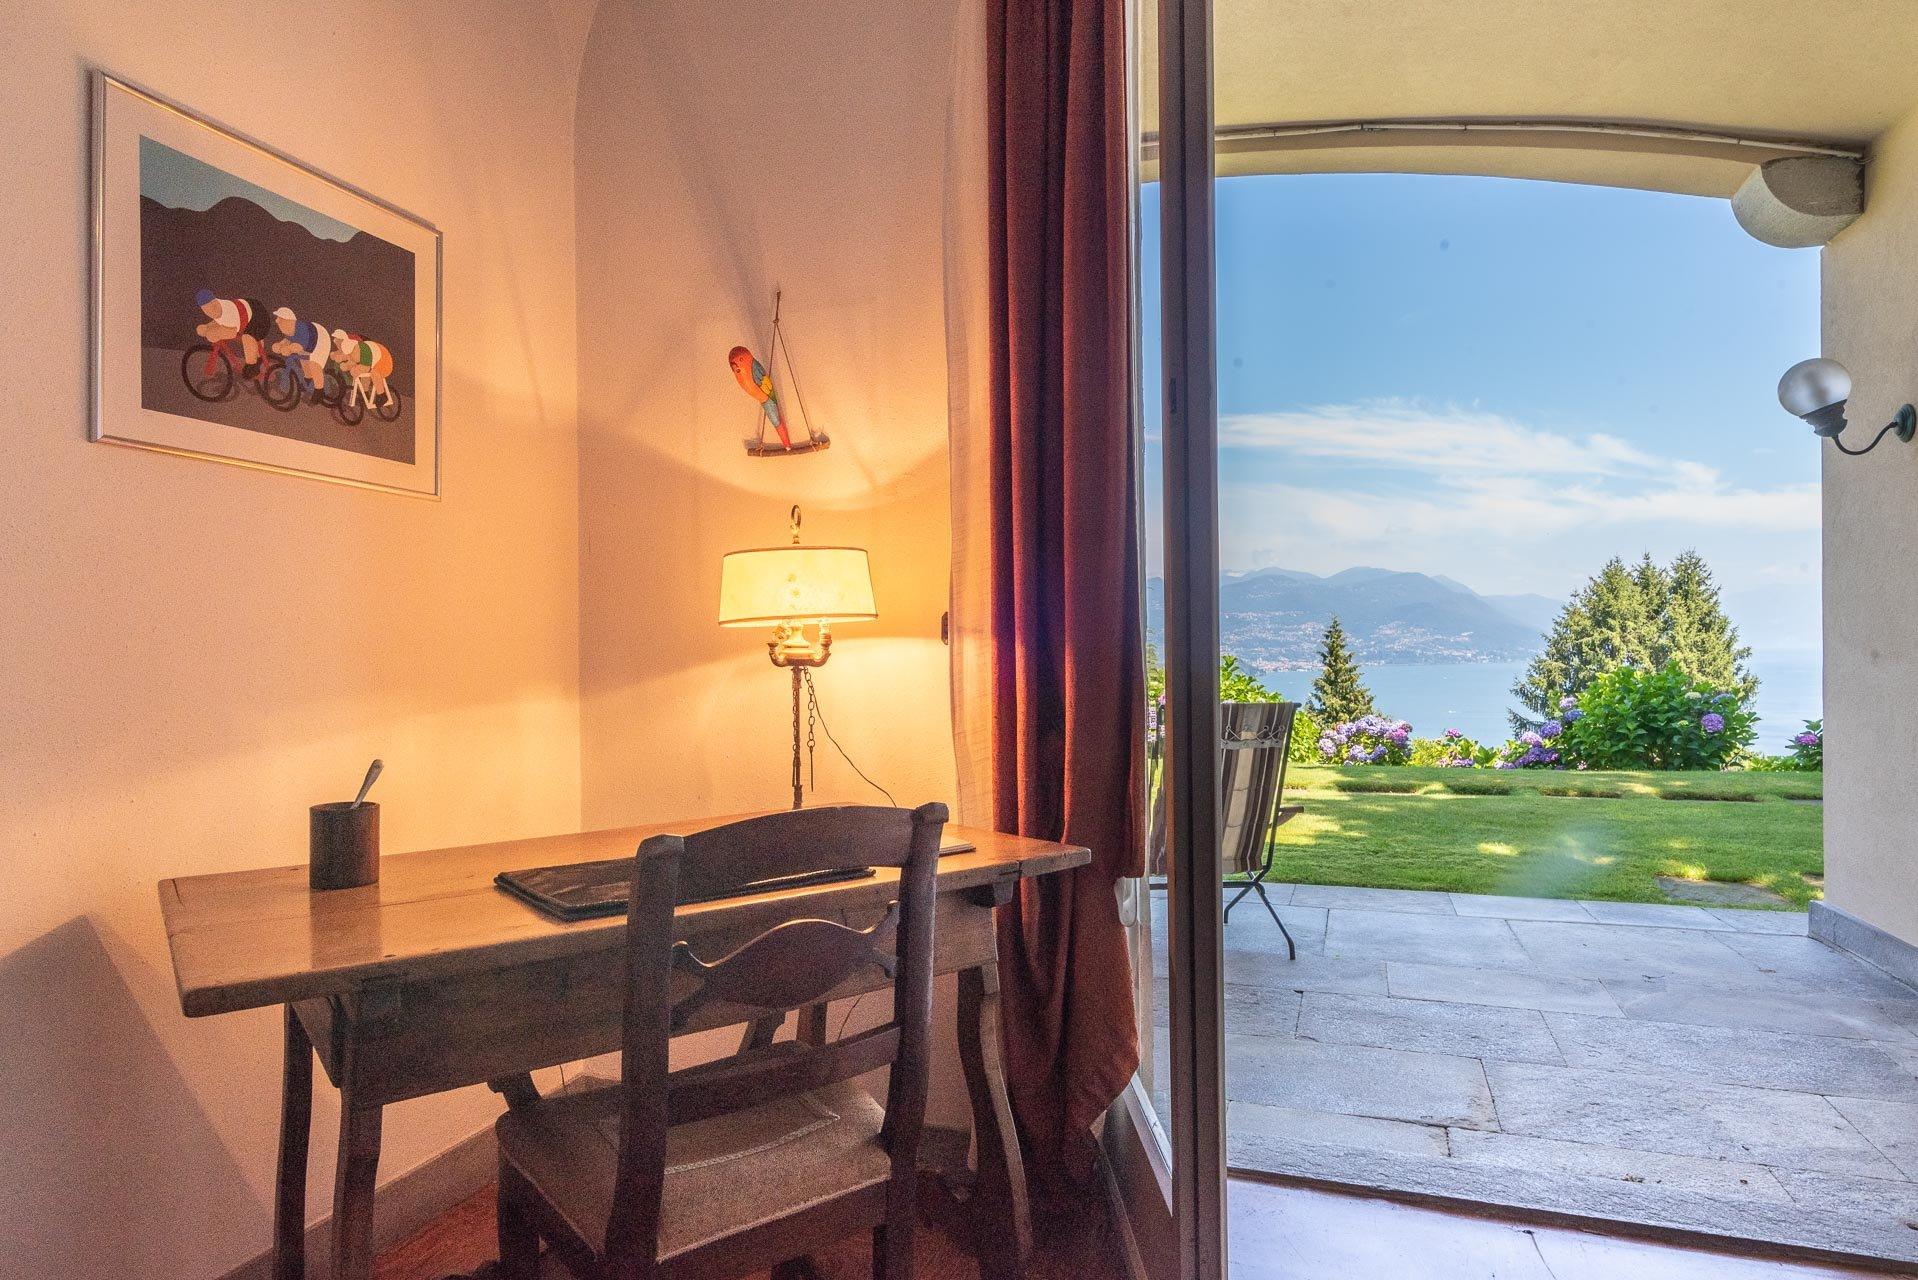 Elegant lake view villa for sale in Stresa - Lake's glimpse